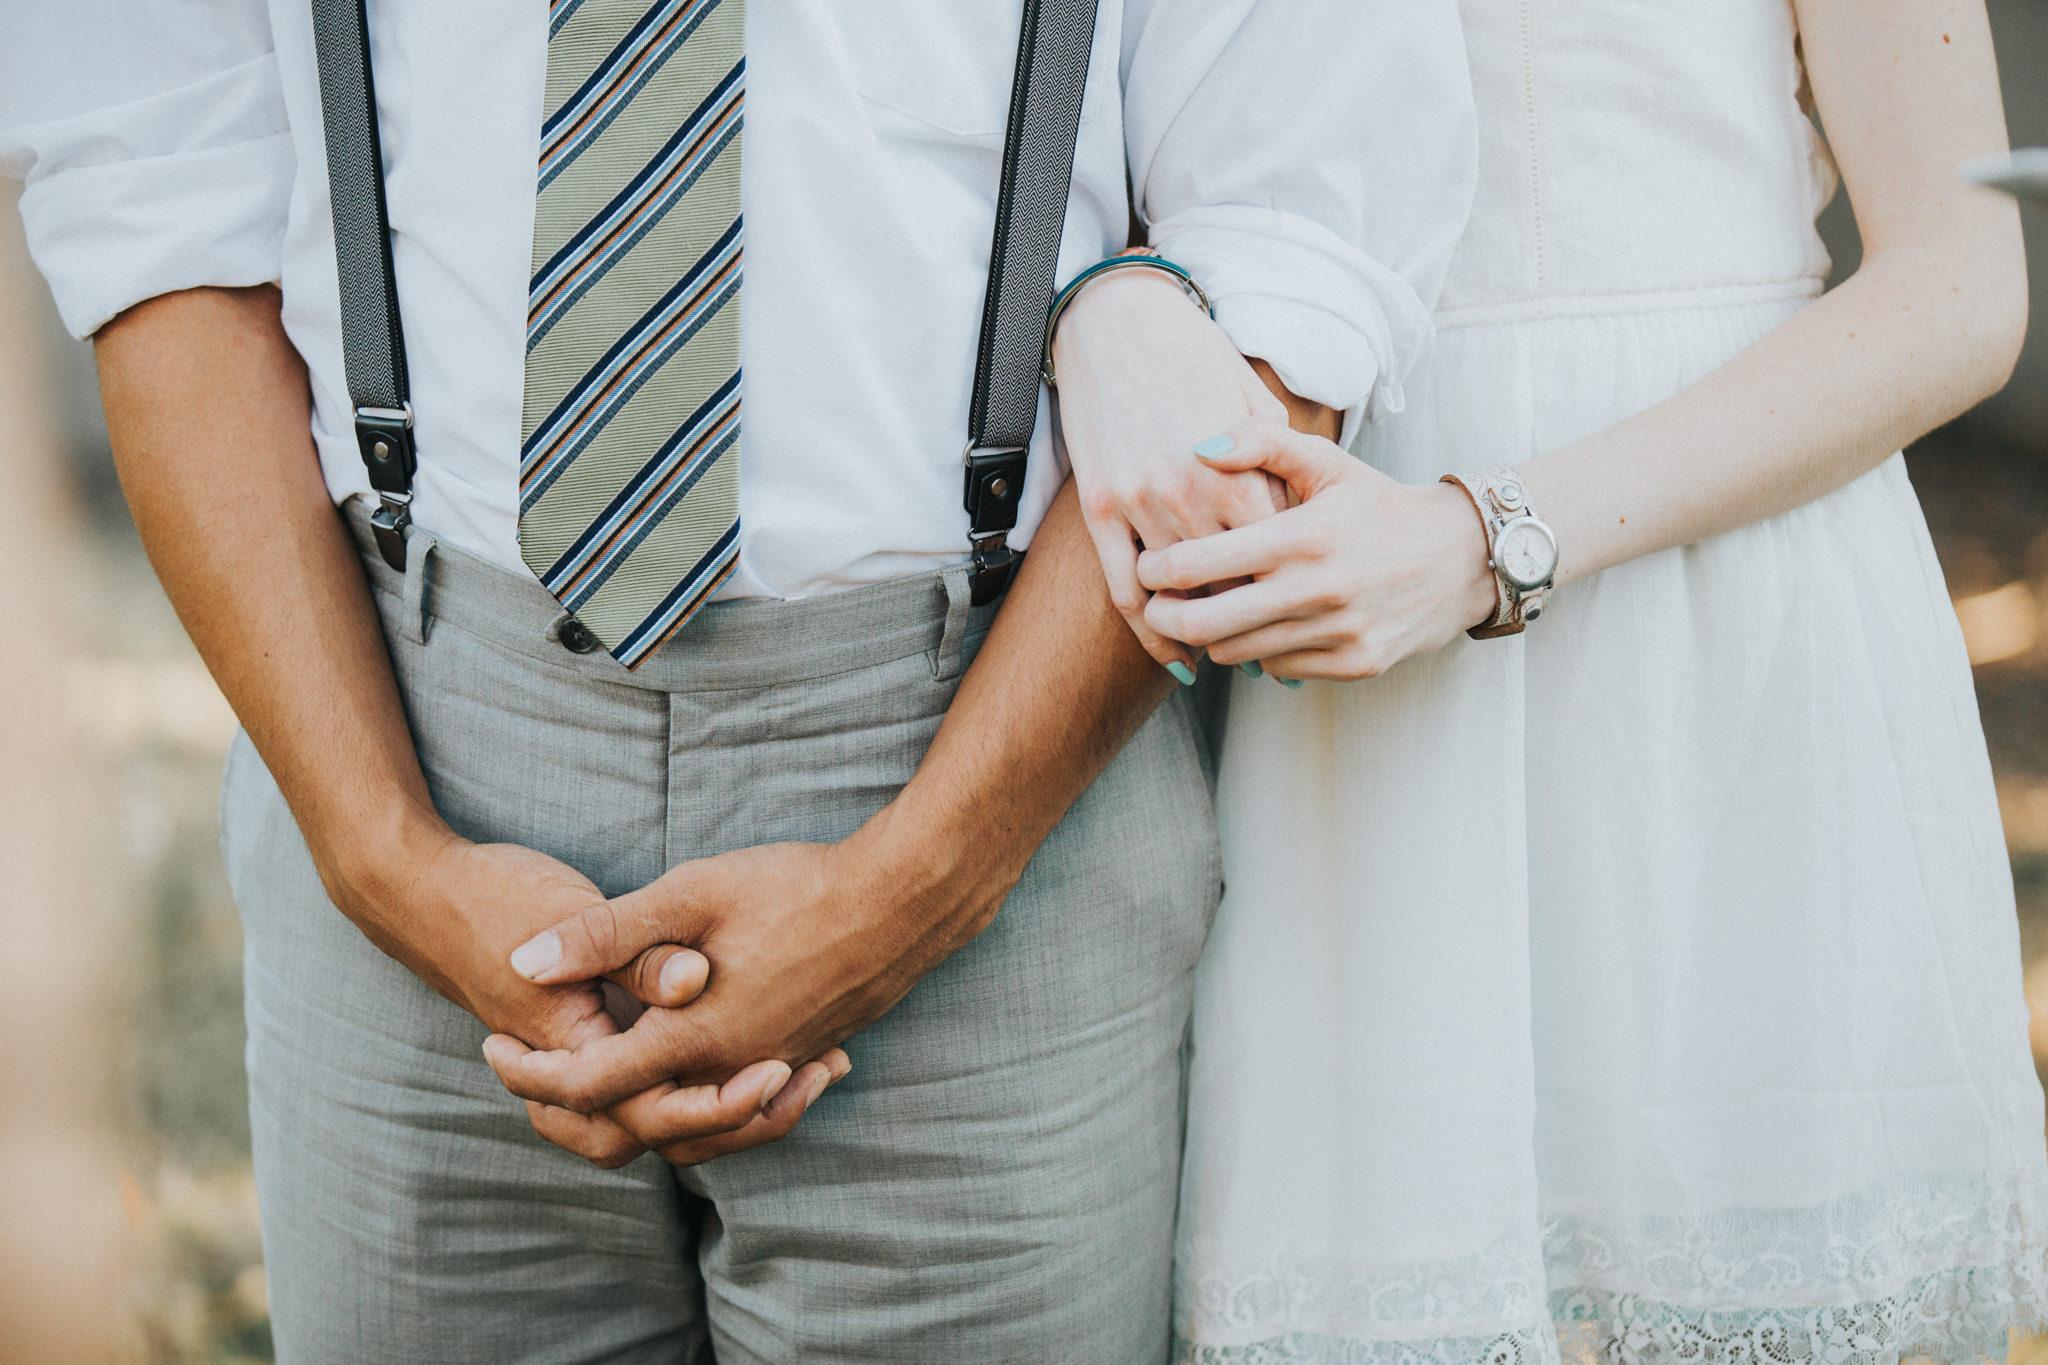 Cathedral Park St. Johns Outdoor Wedding | Kai Hayashi Photography